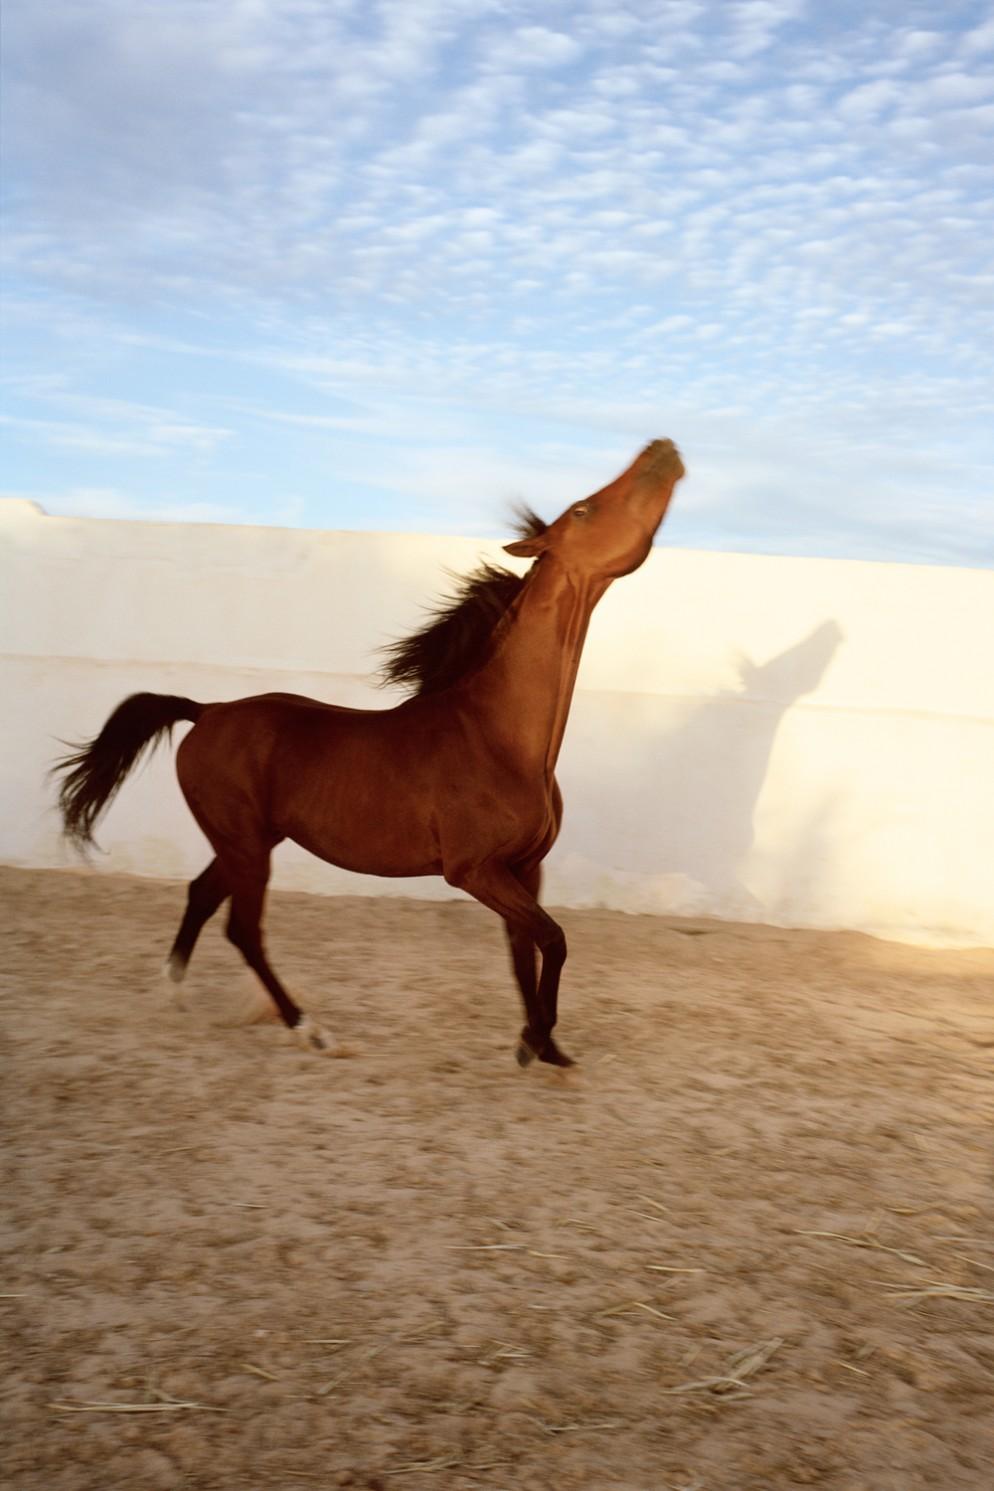 07_JH_HORSE_2007-2014.300